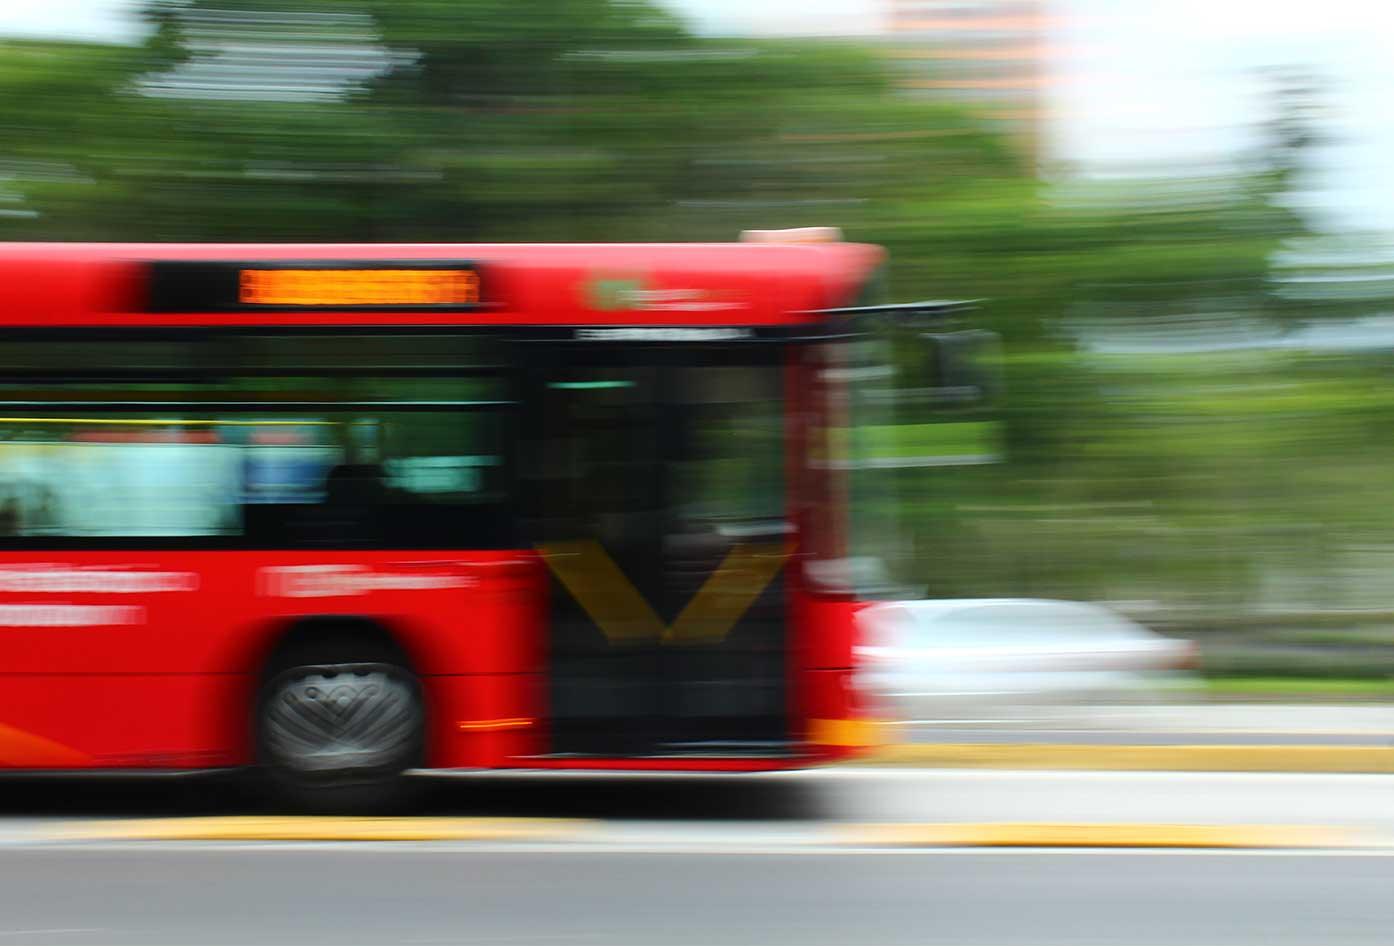 bus in mexico city